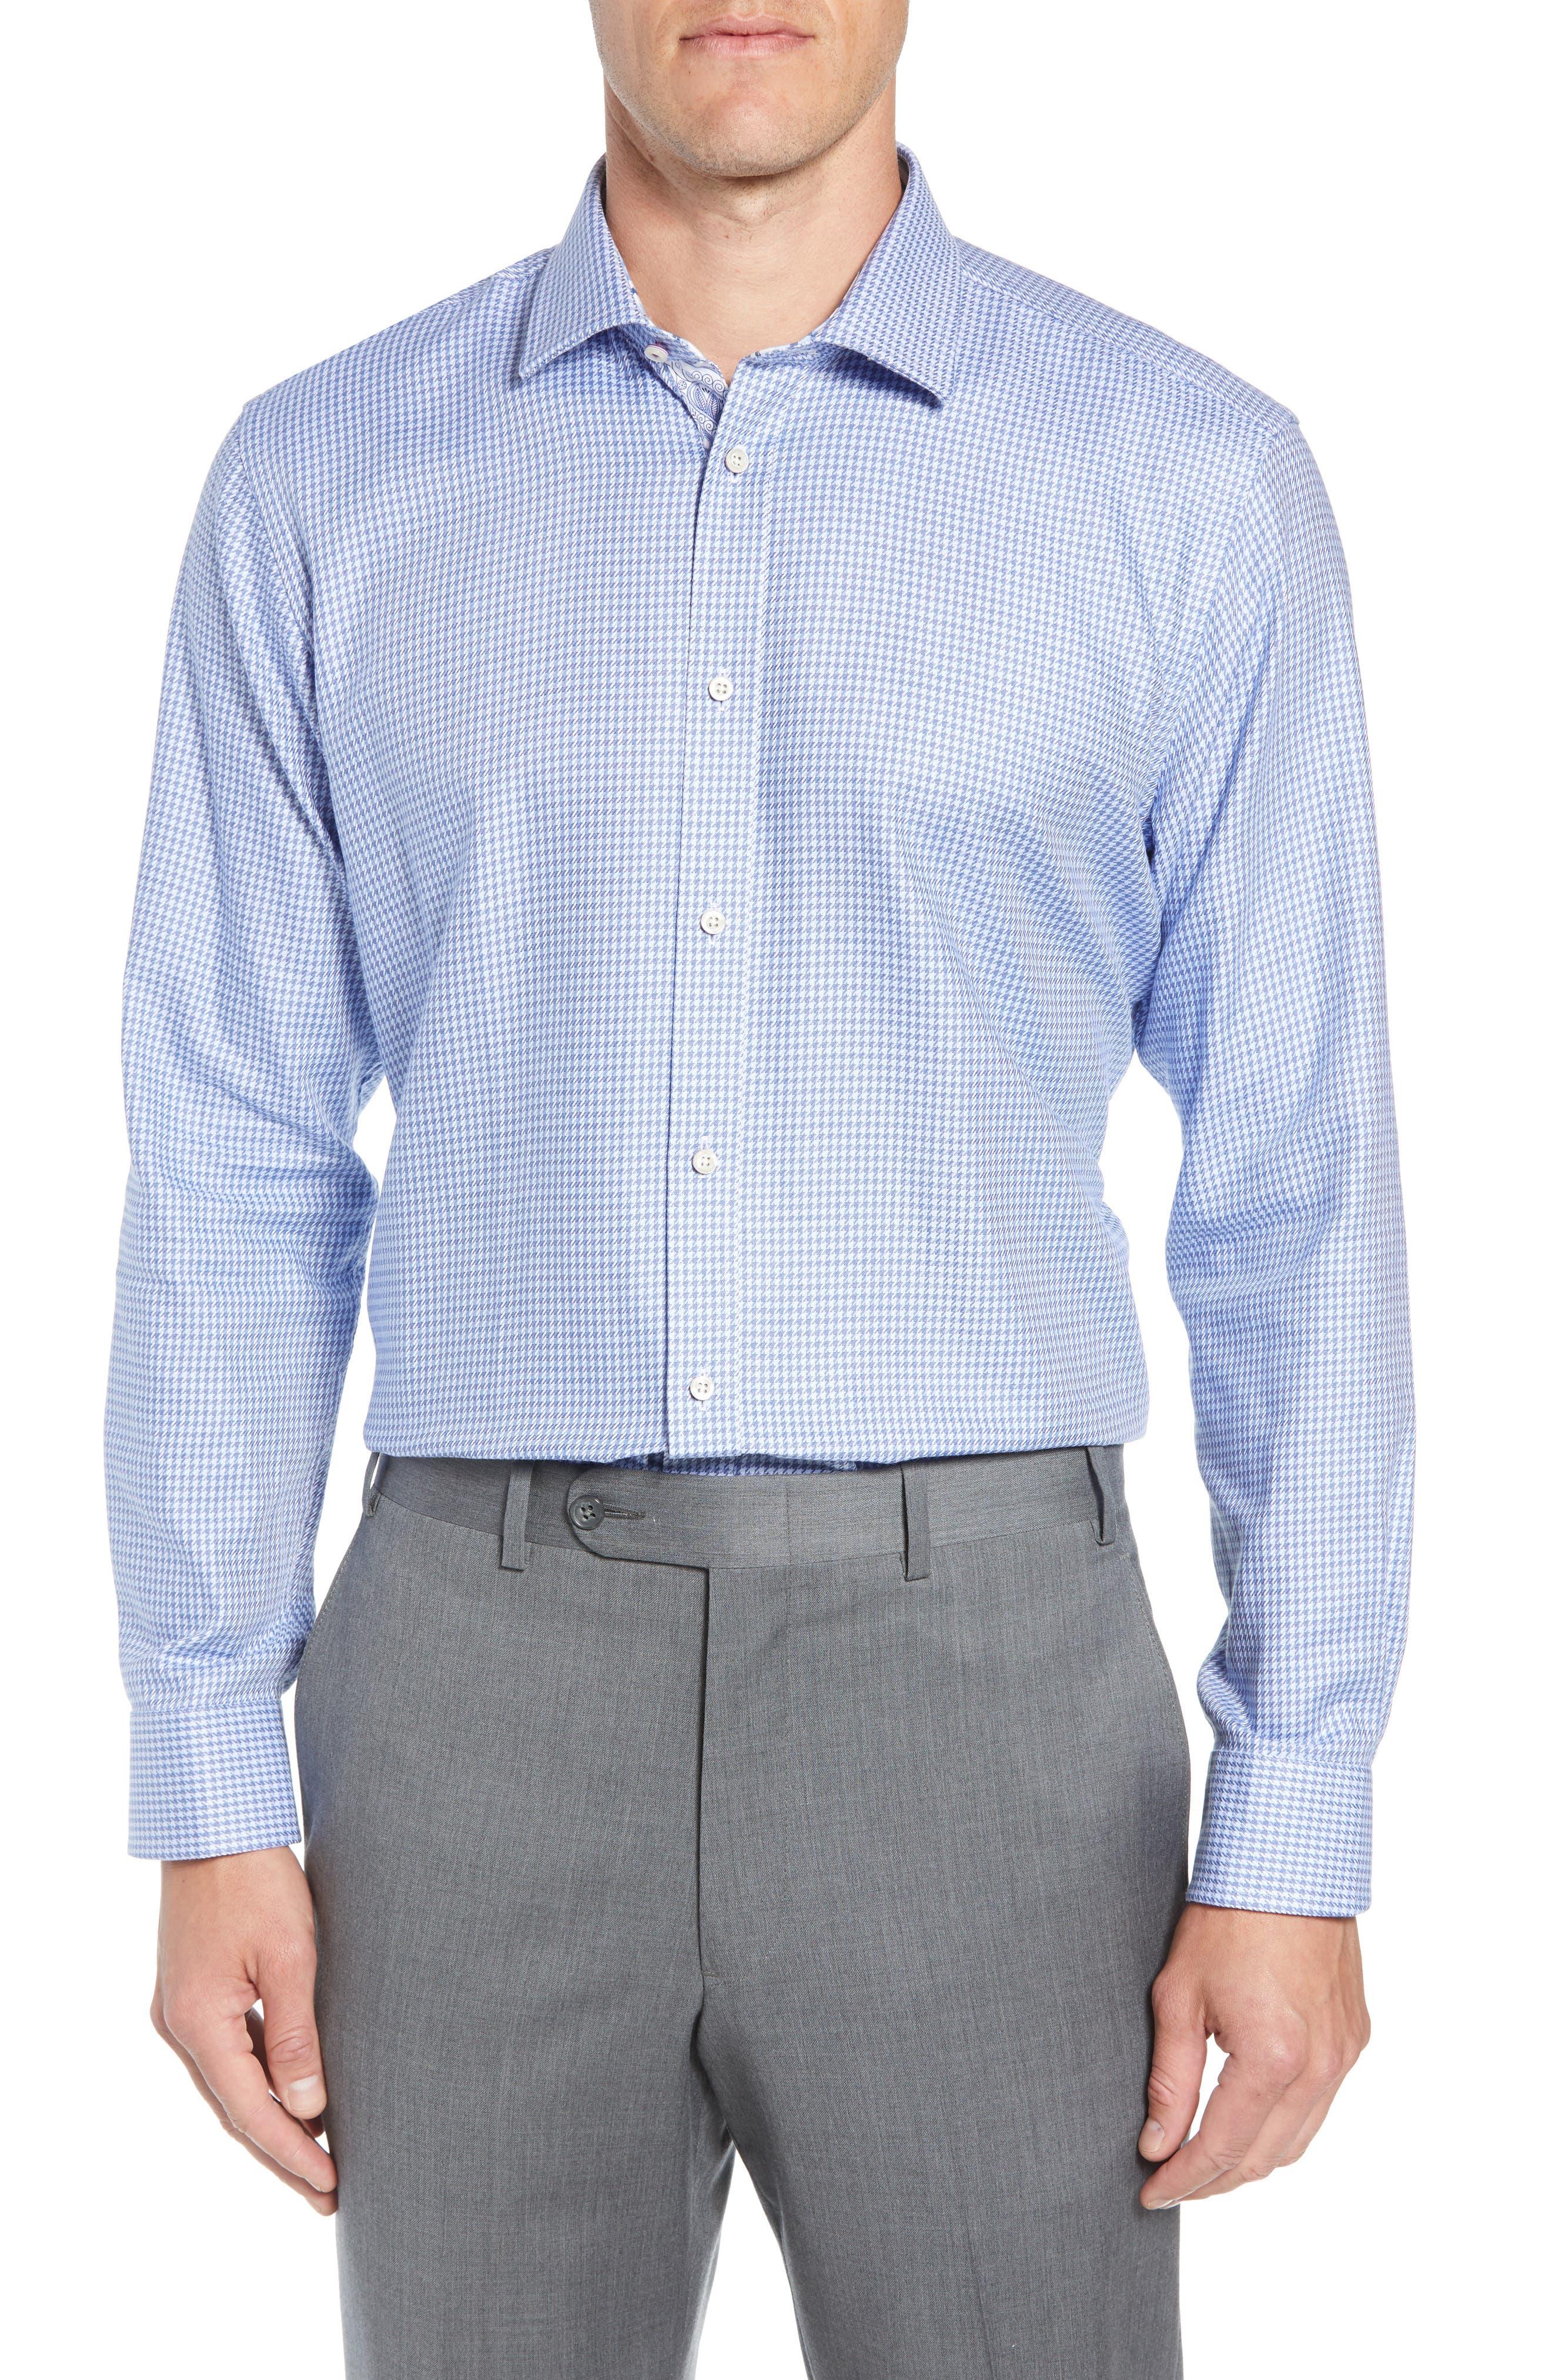 Franks Trim Fit Houndstooth Dress Shirt,                         Main,                         color, BLUE